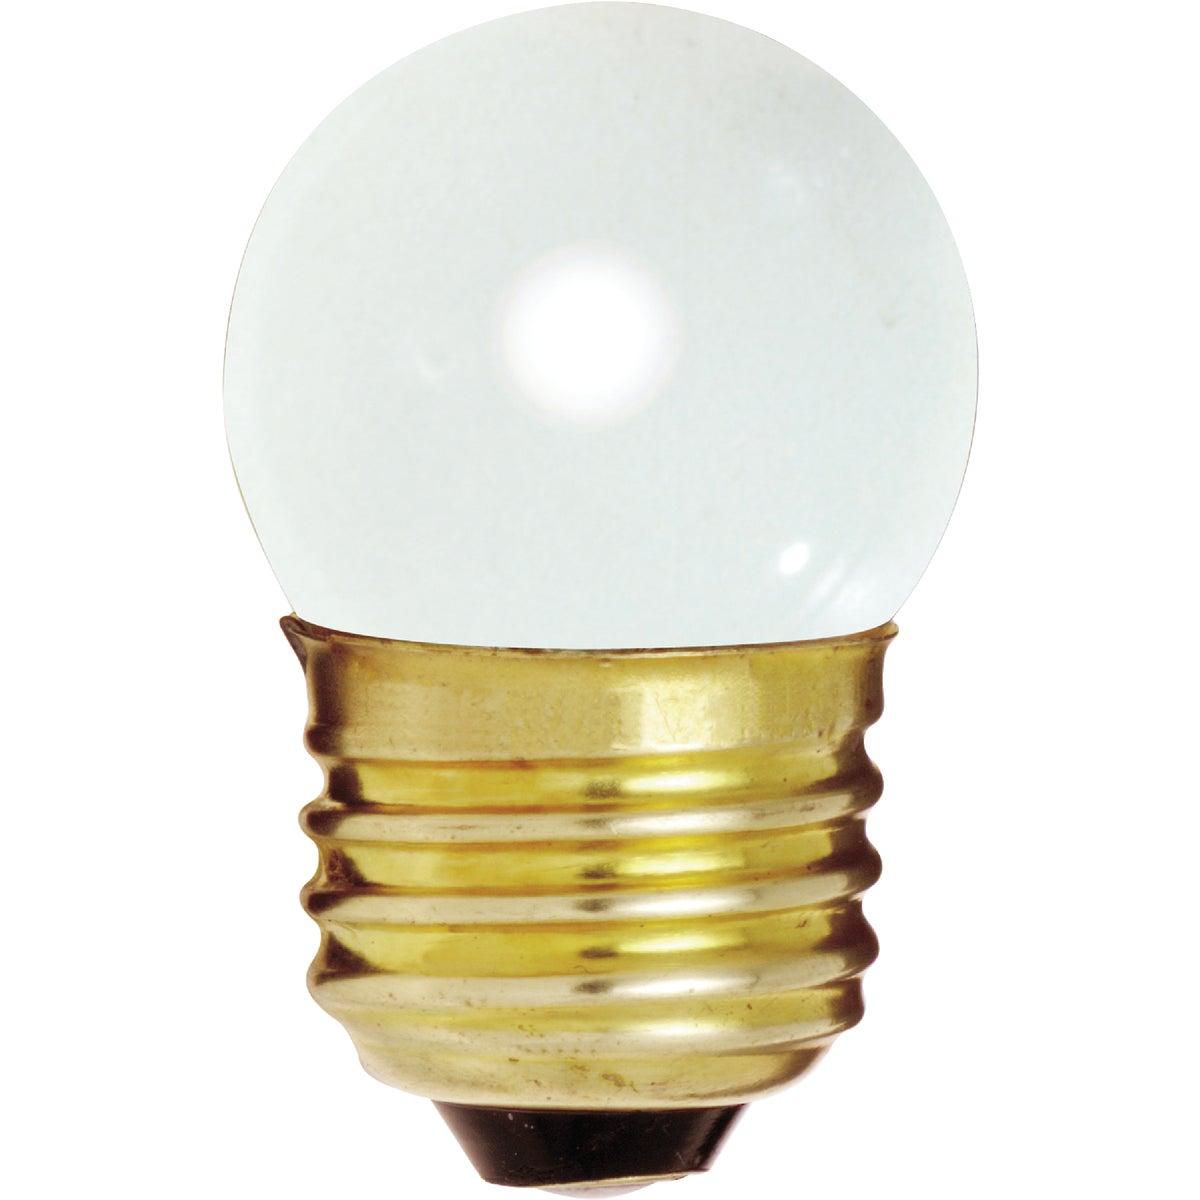 7-1/2W WHT UTILITY BULB - 41267 by G E Lighting